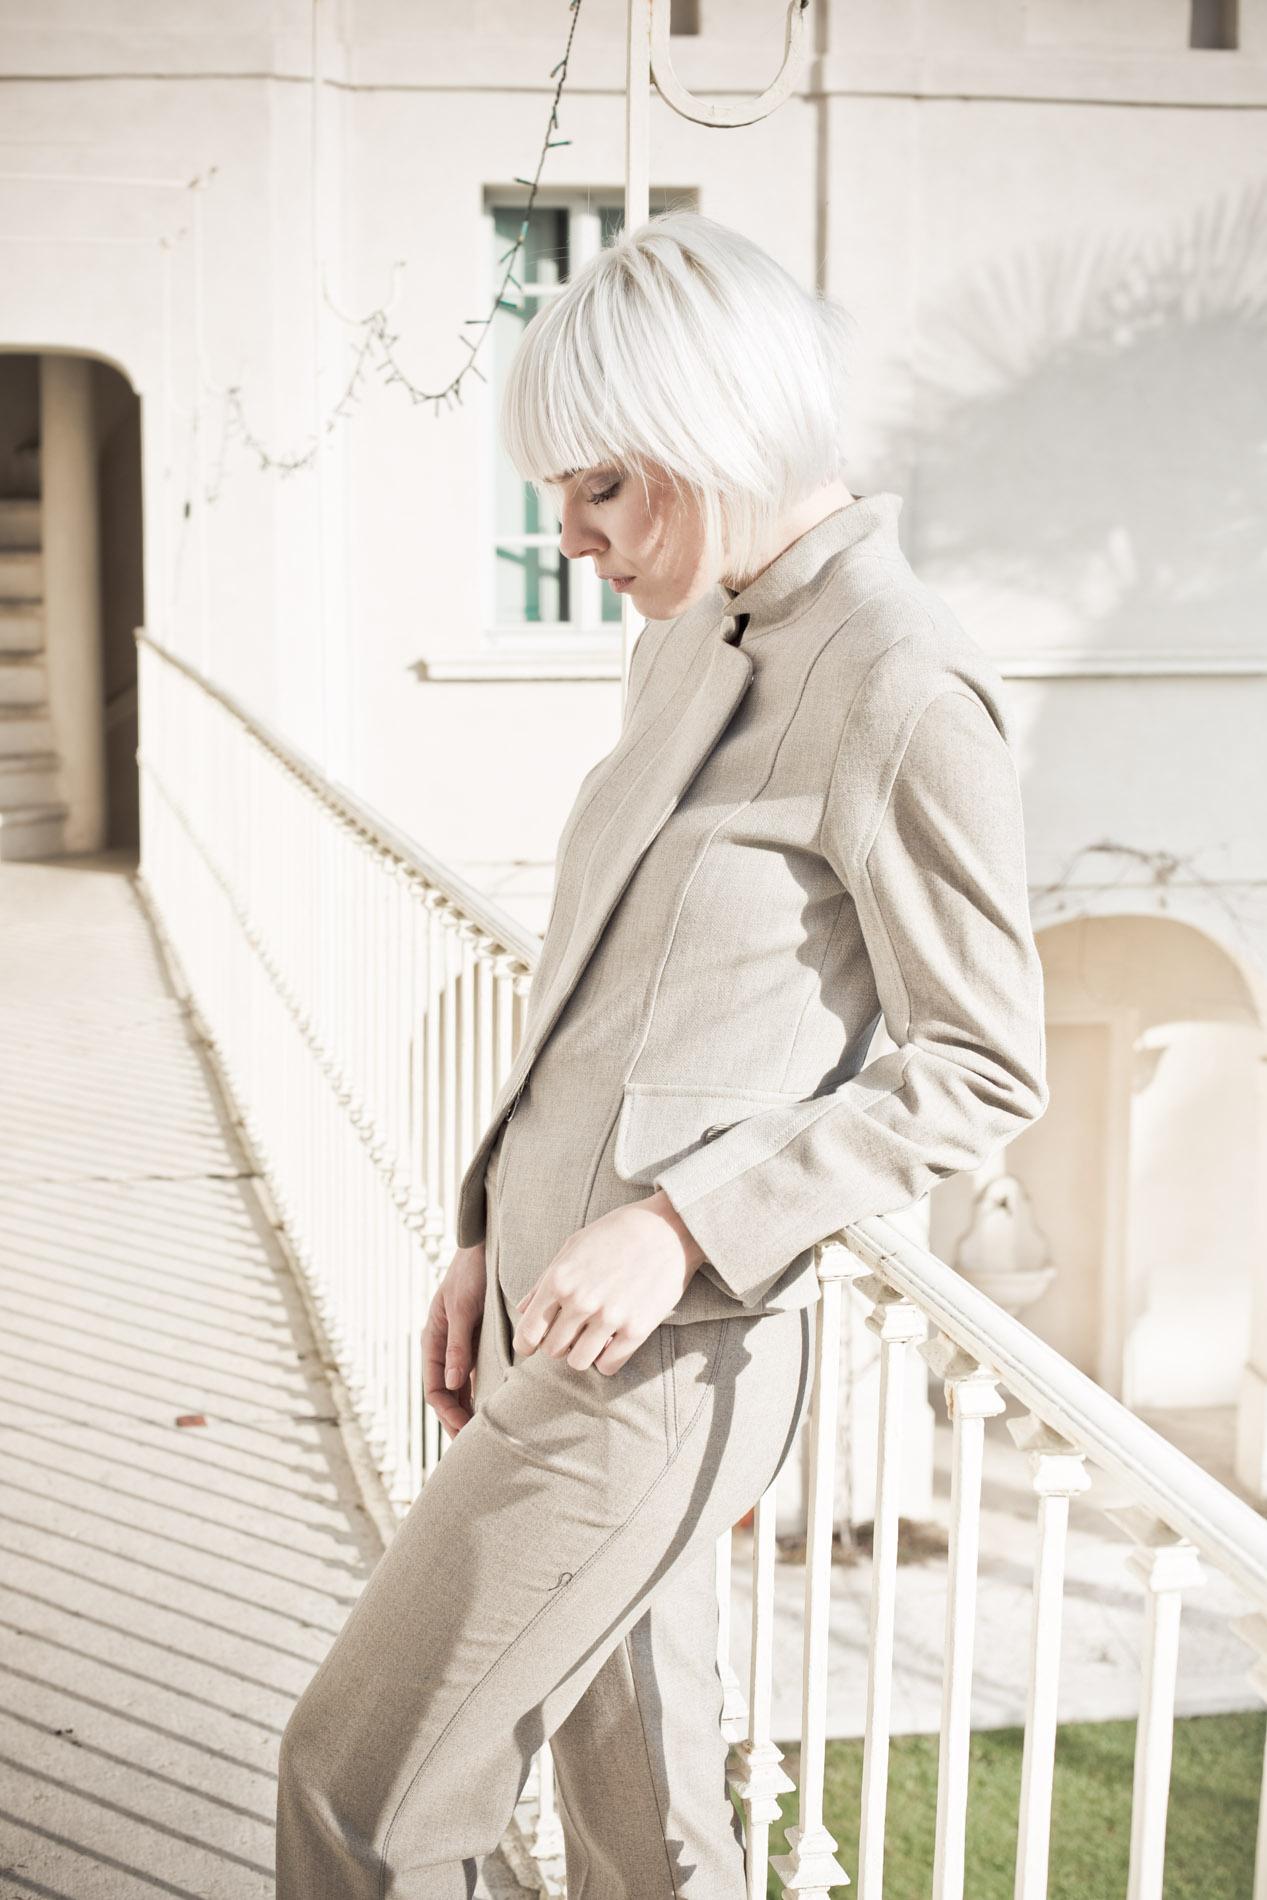 Pelliccia in Kalgan, giacca e pantalone in tessuto in filo di ceramica